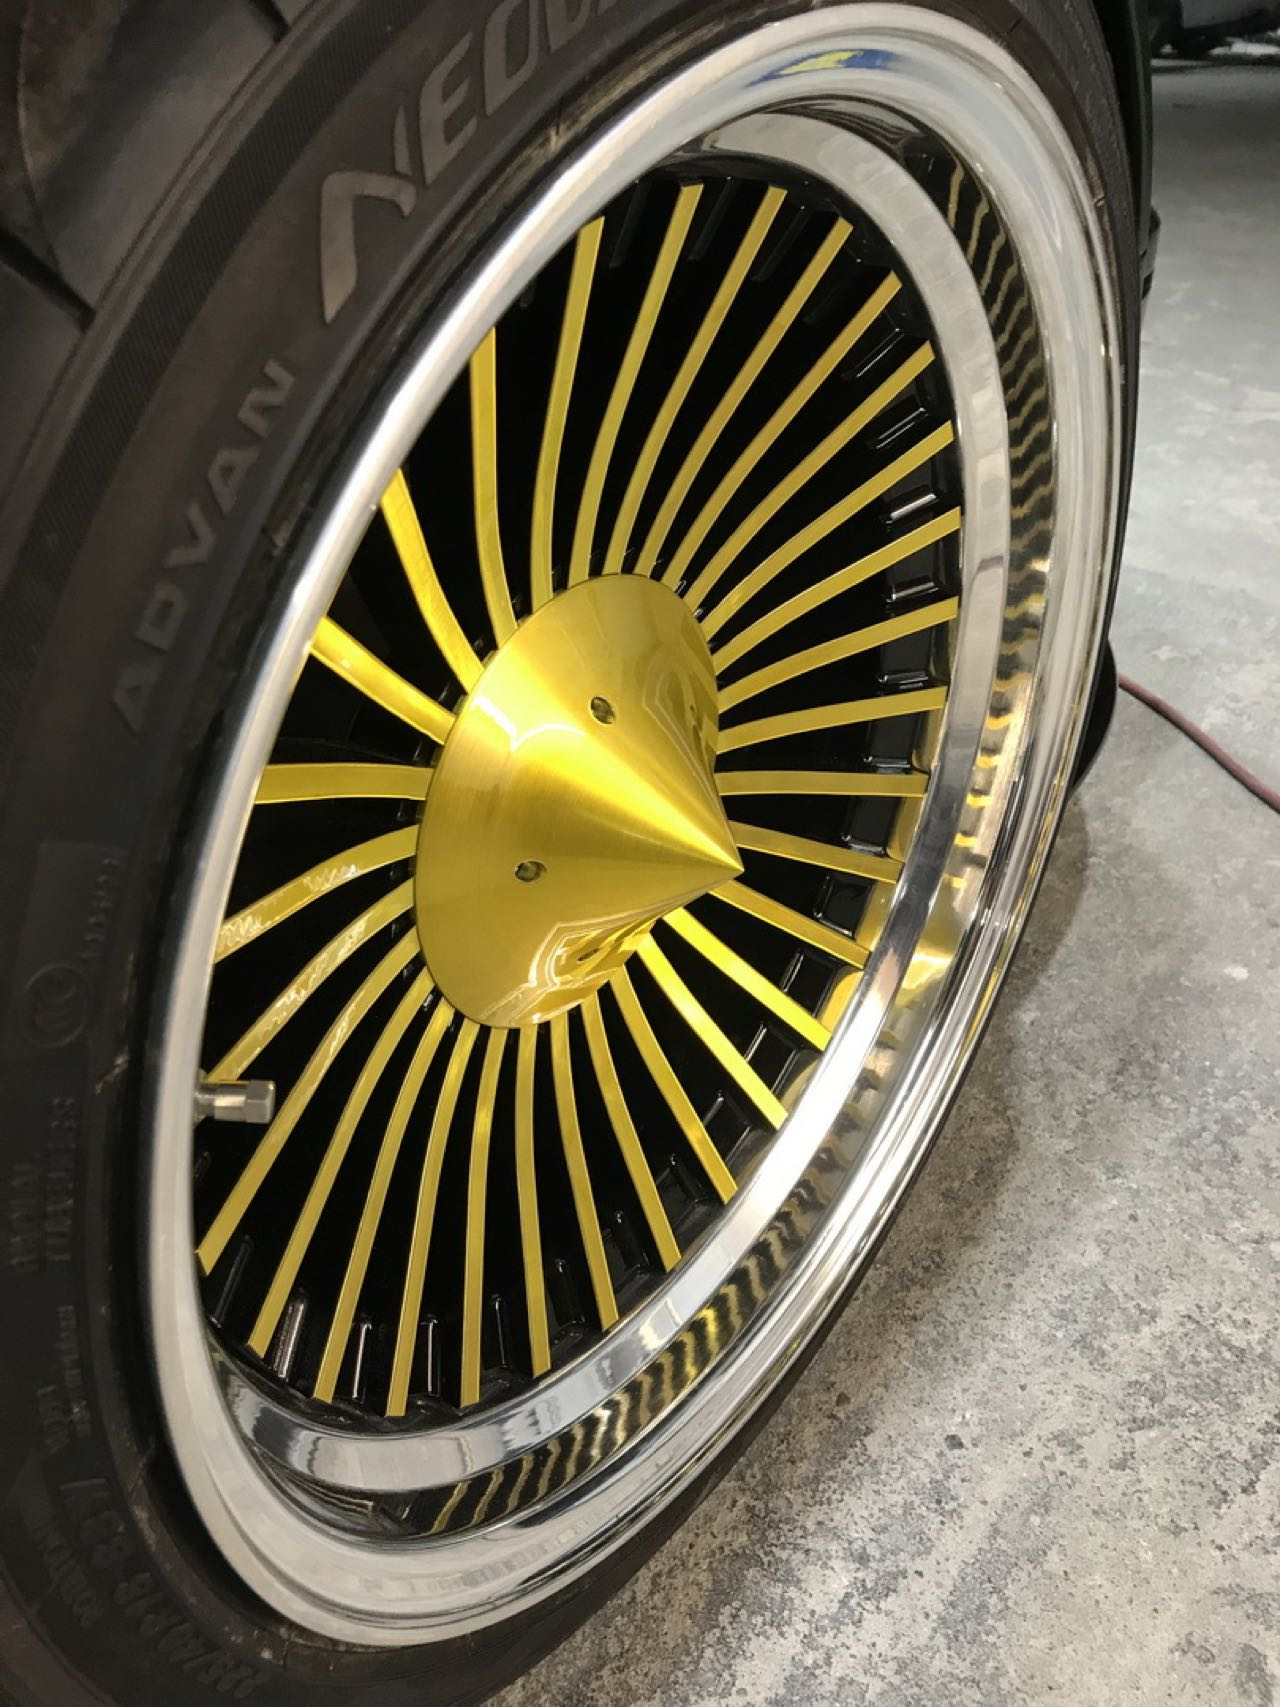 '93 Porsche 965 Turbo Wagenbauanstalt... custom ! 41